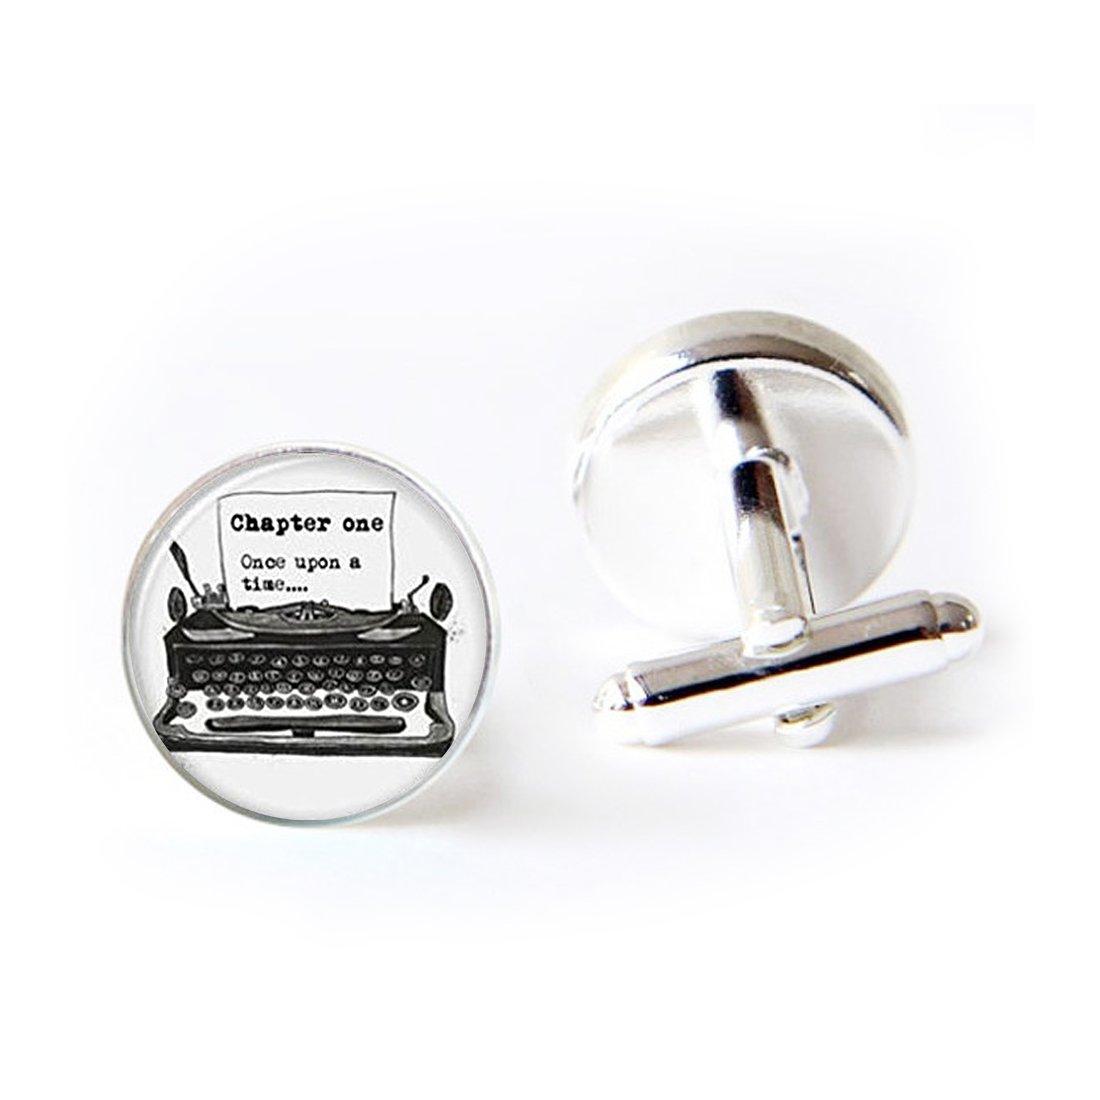 JEANCZ Jewelry Stainless Cufflinks Old Typewriter Vintage Writer Pendant Glass Classic Tuxedo Shirt Cufflinks with Elegant Storage Display Box by JEANCZ (Image #1)